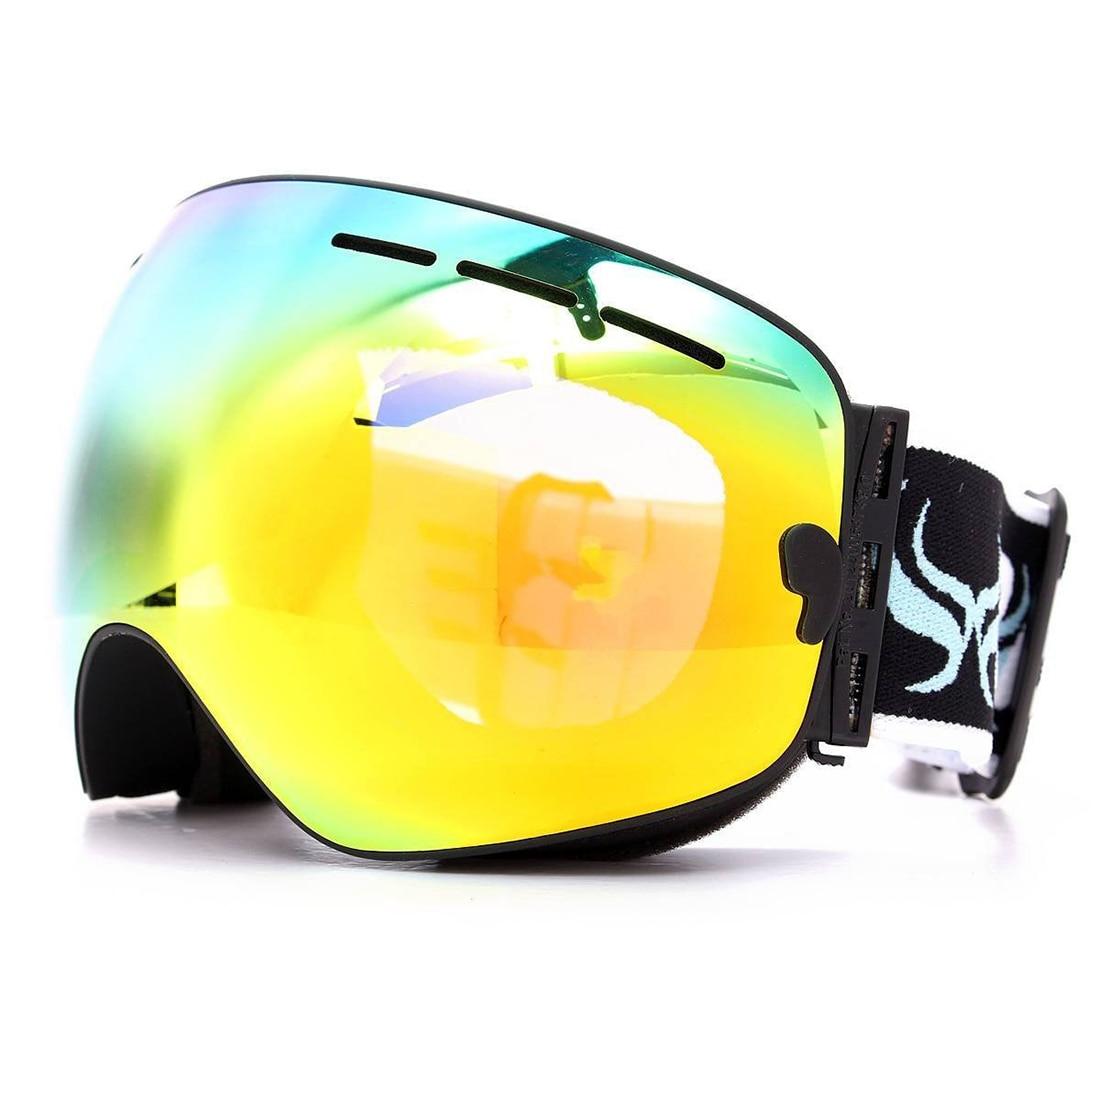 BENICE ski goggles double layer anti-fog eyes black frame